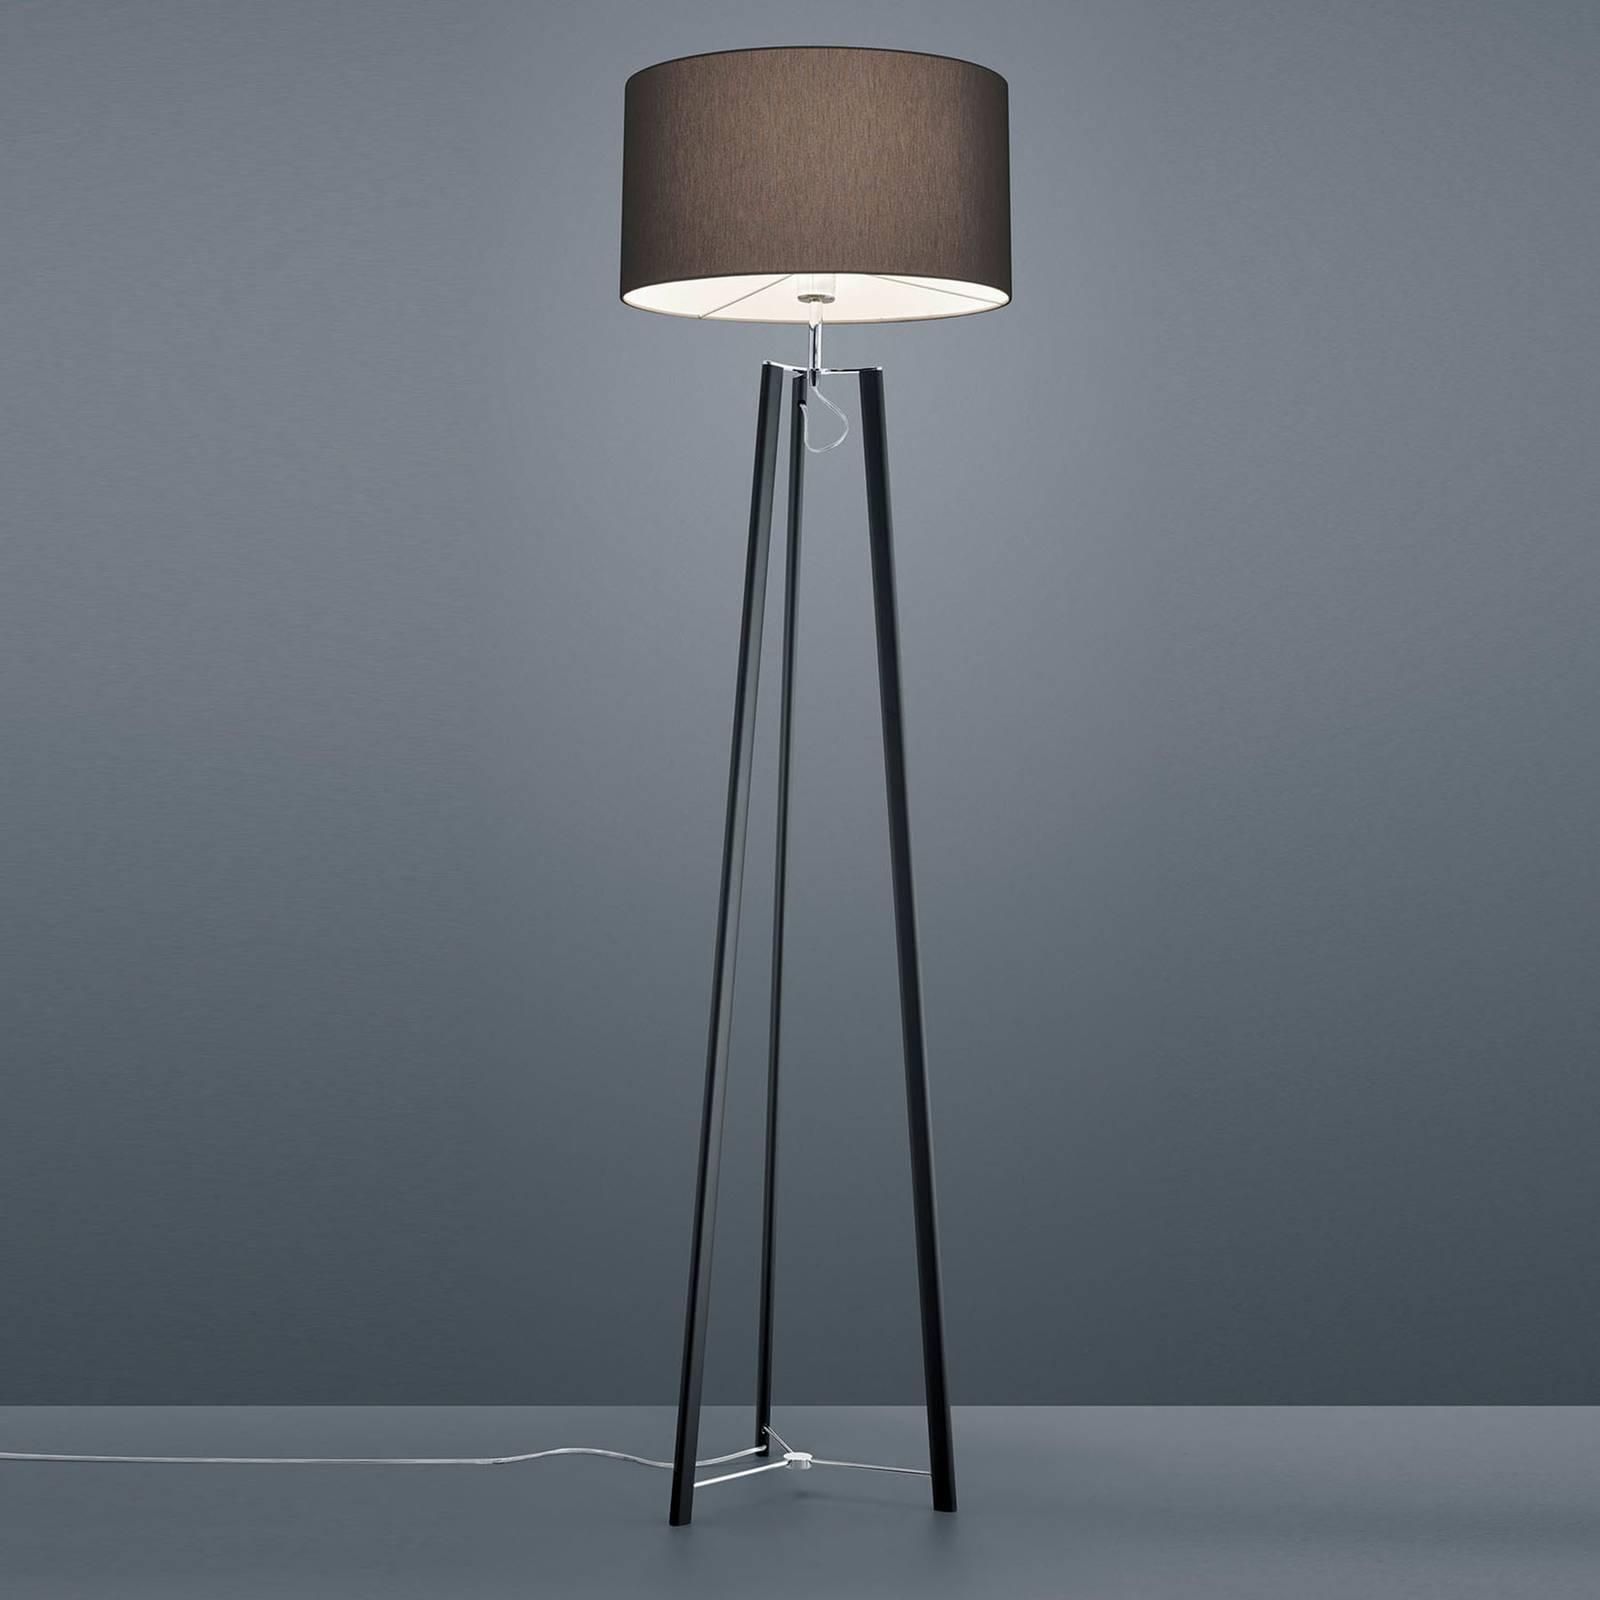 Helestra Certo driepootvloerlamp, antraciet